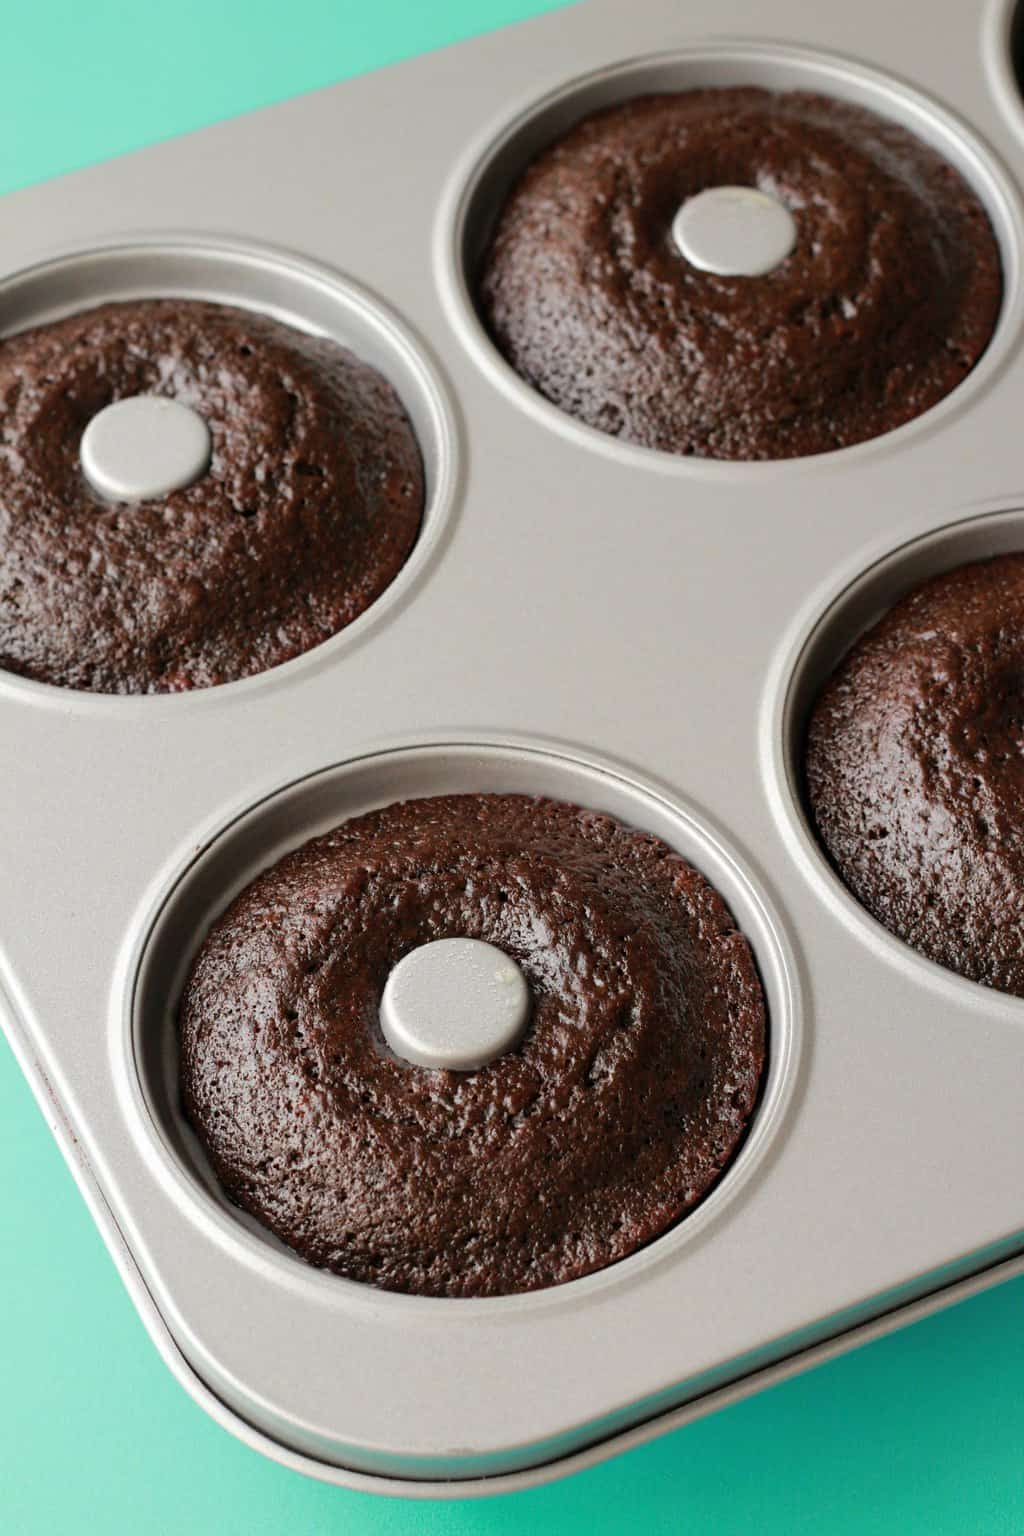 Making Vegan Chocolate Donuts #vegan #lovingitvegan #donuts #dessert